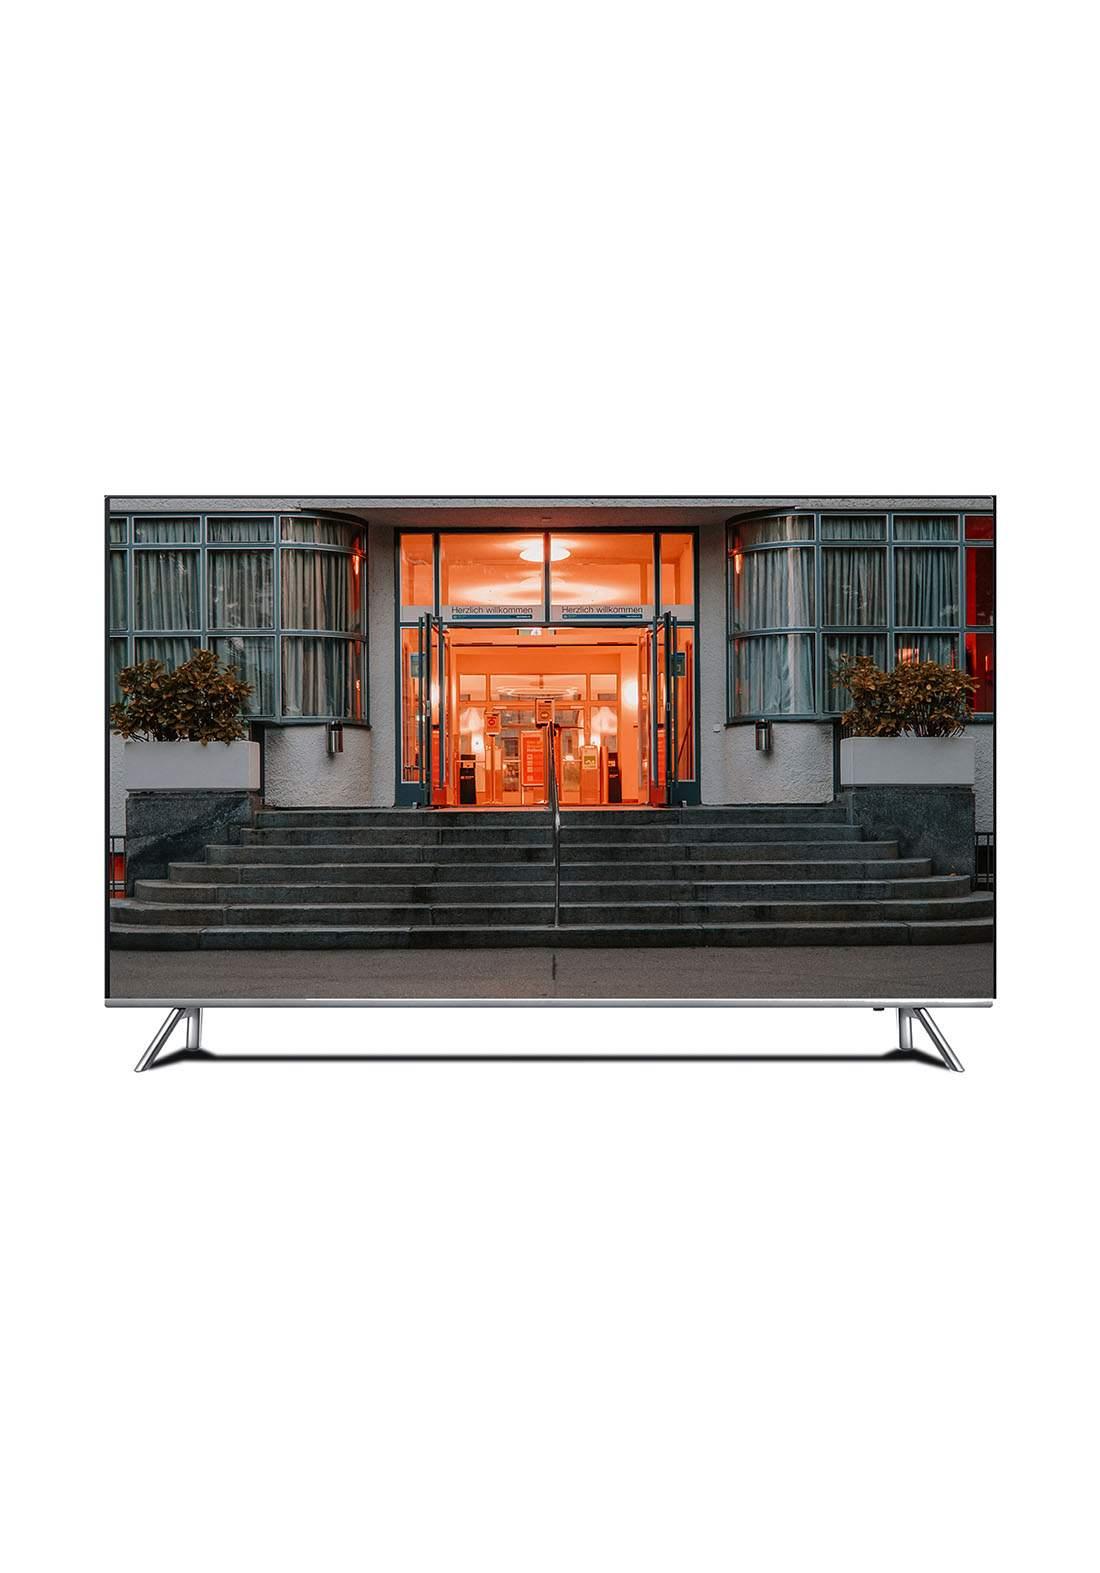 Shark Led Tv - 55inch 4K شاشة